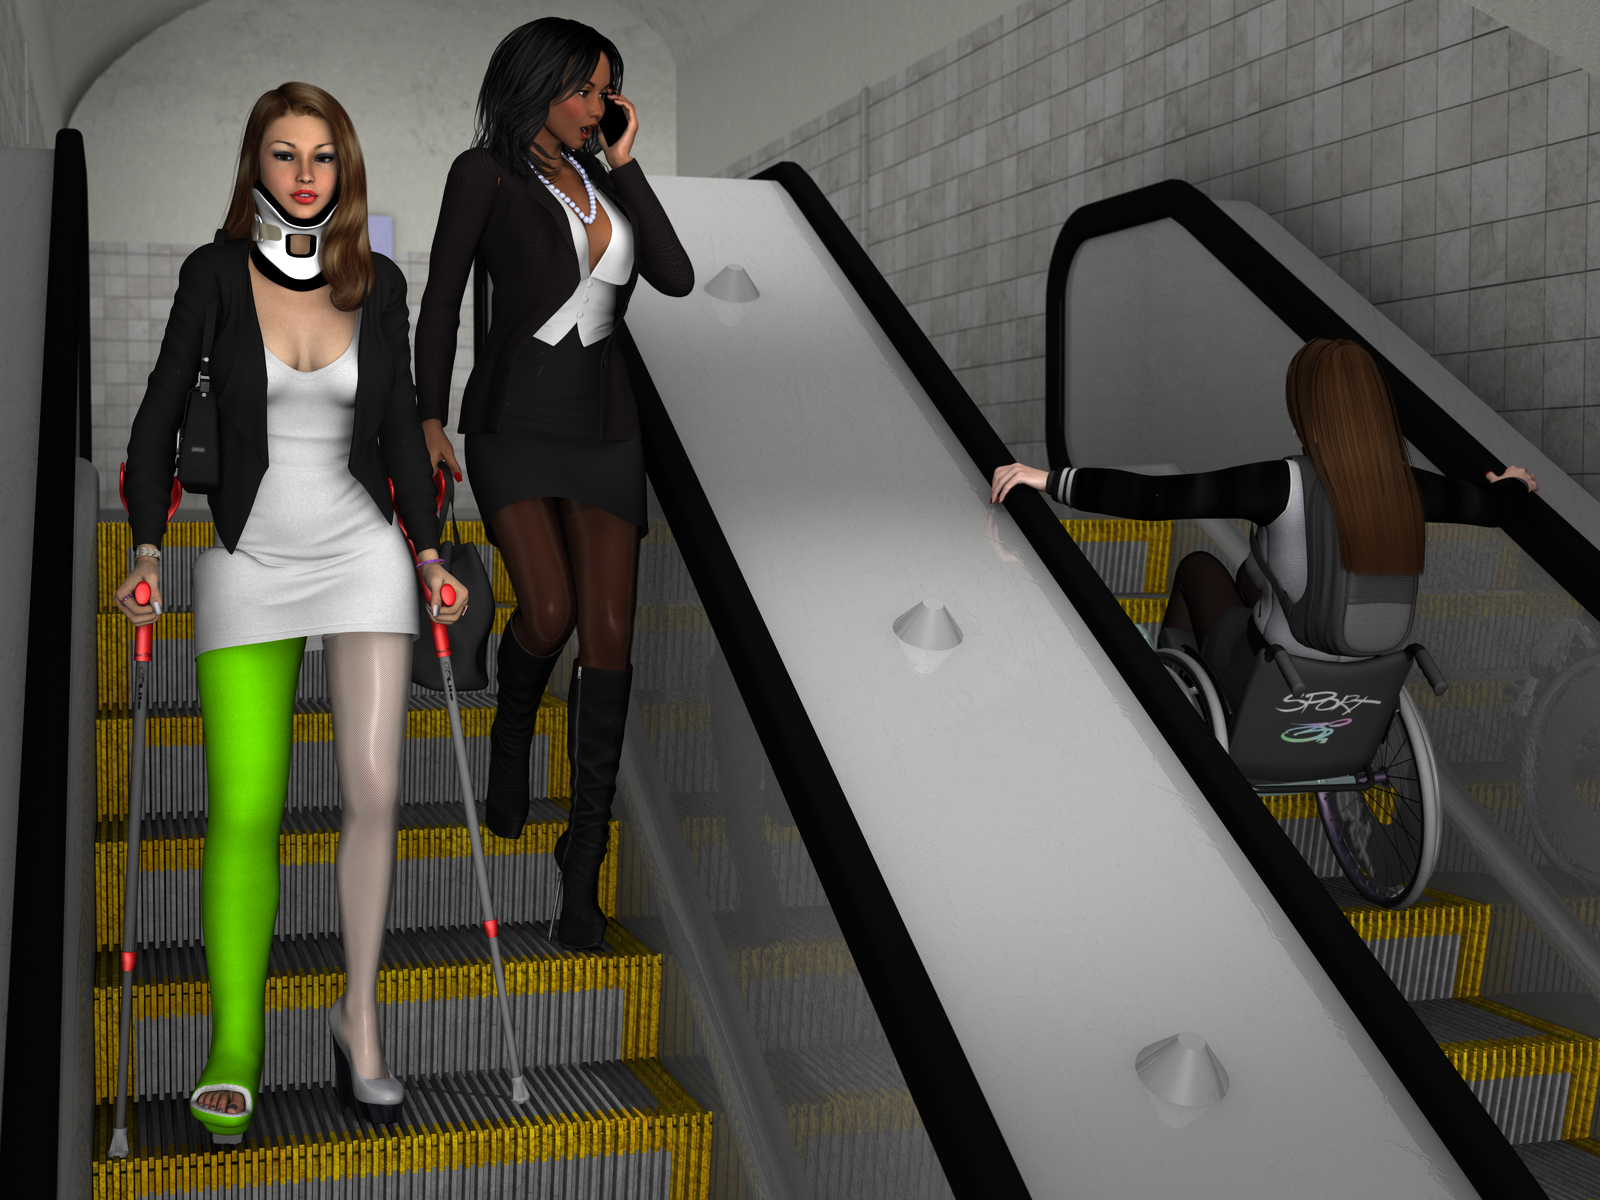 Escalator ride by rizzo-cast on DeviantArt